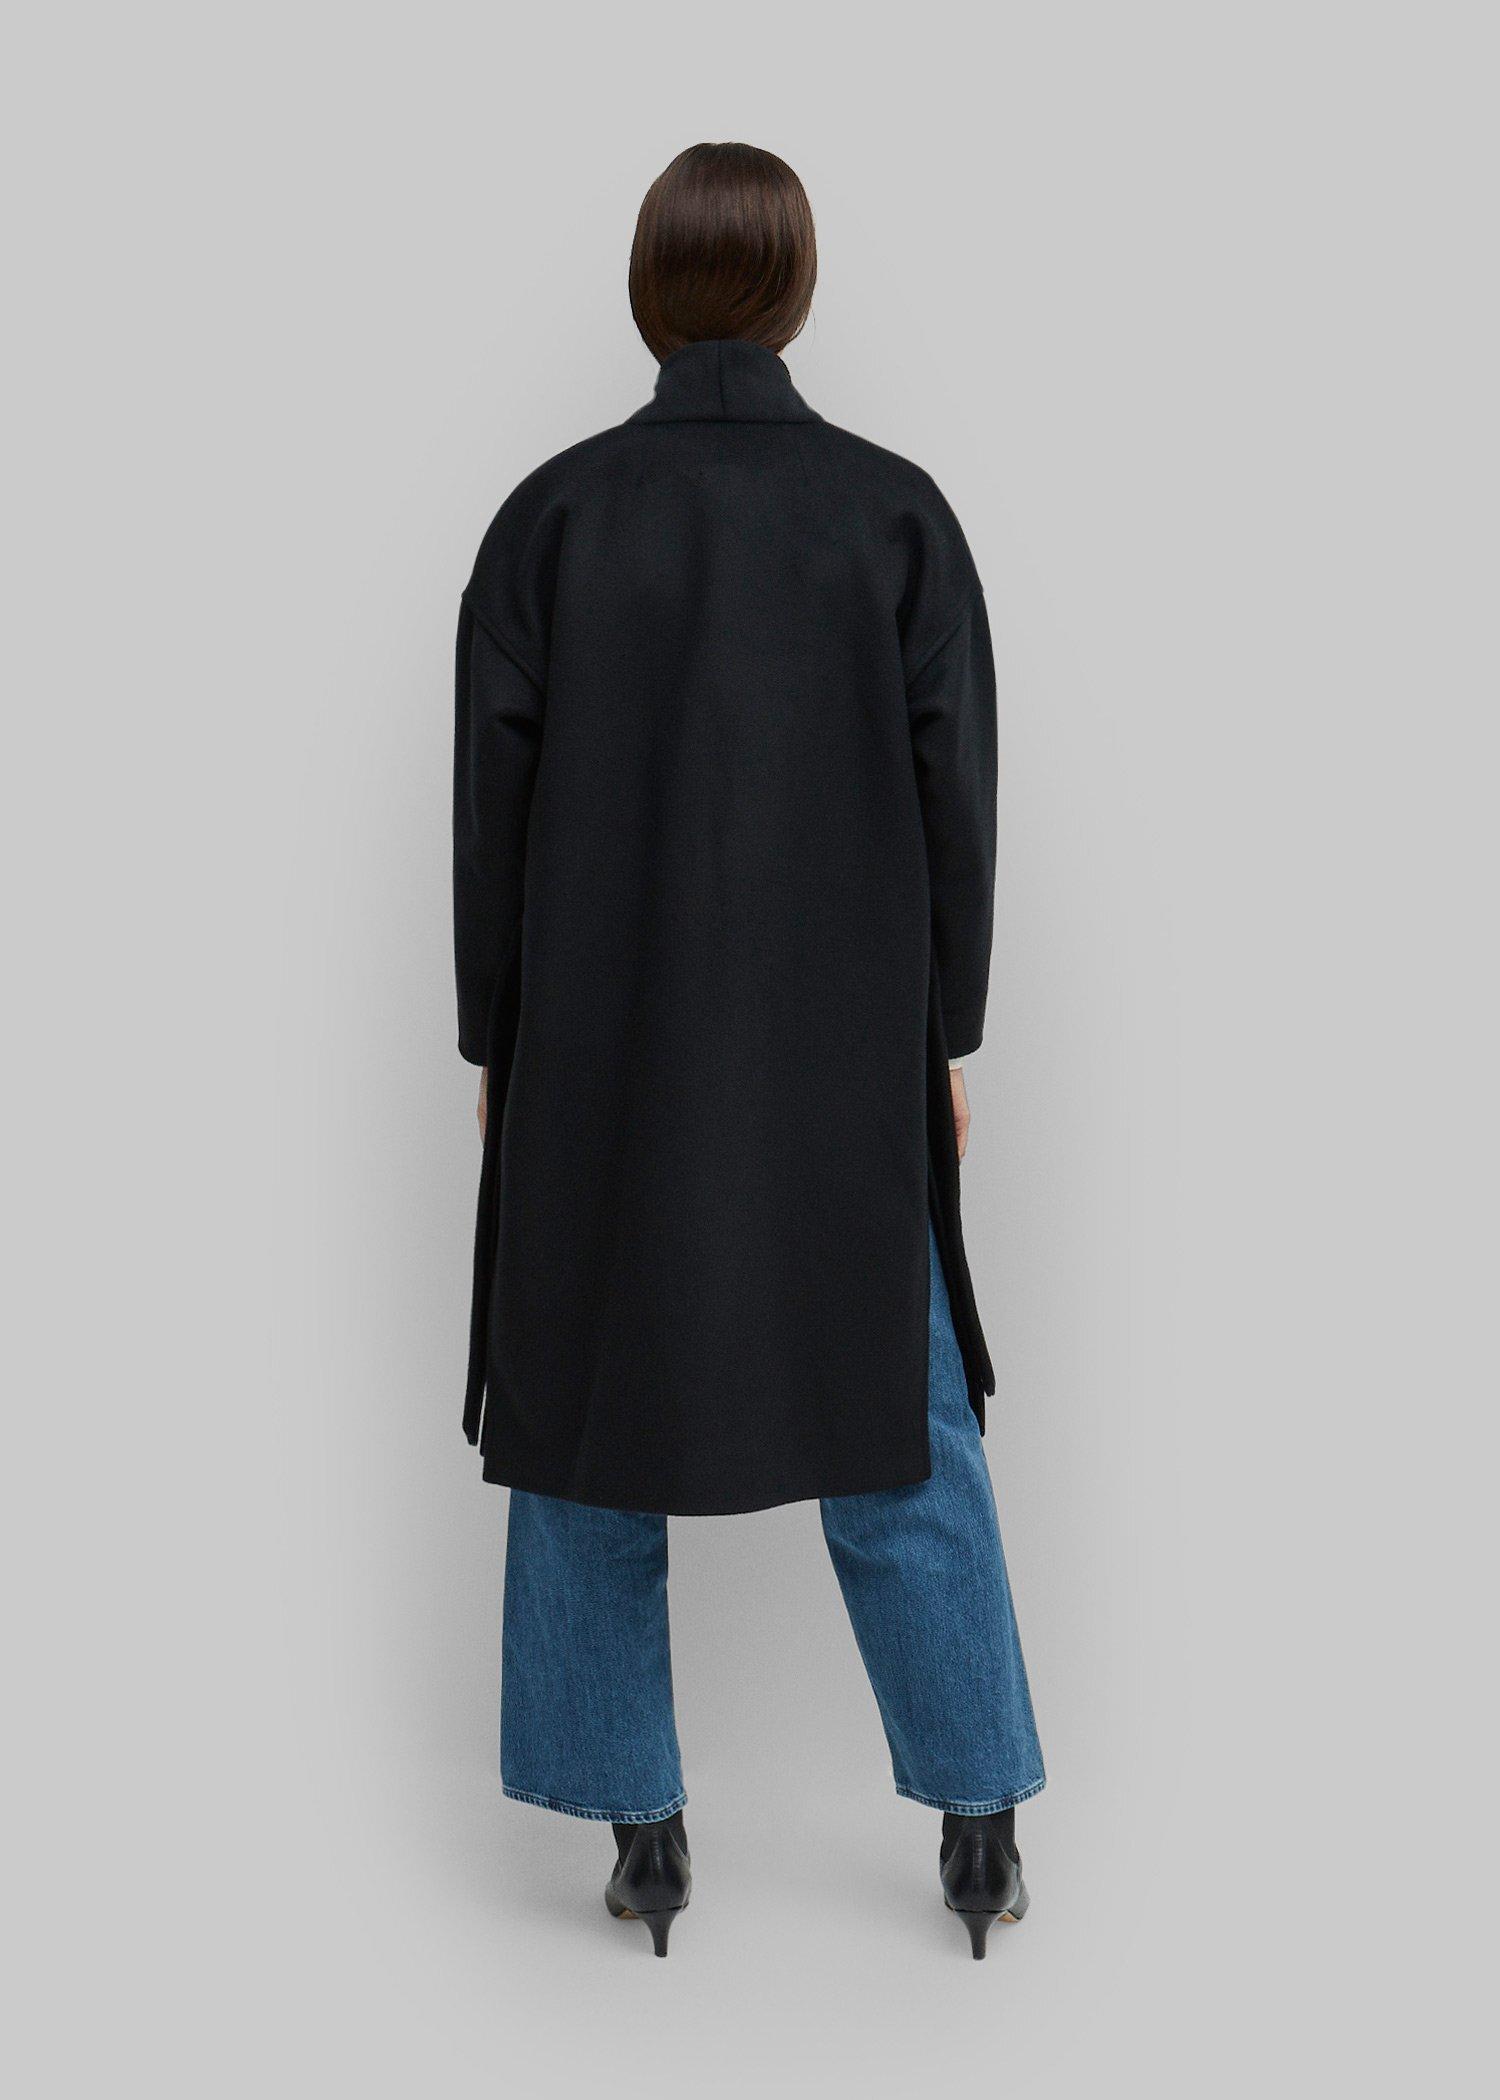 16_toteme_-fw19_chelsea_coat_black_055.jpg